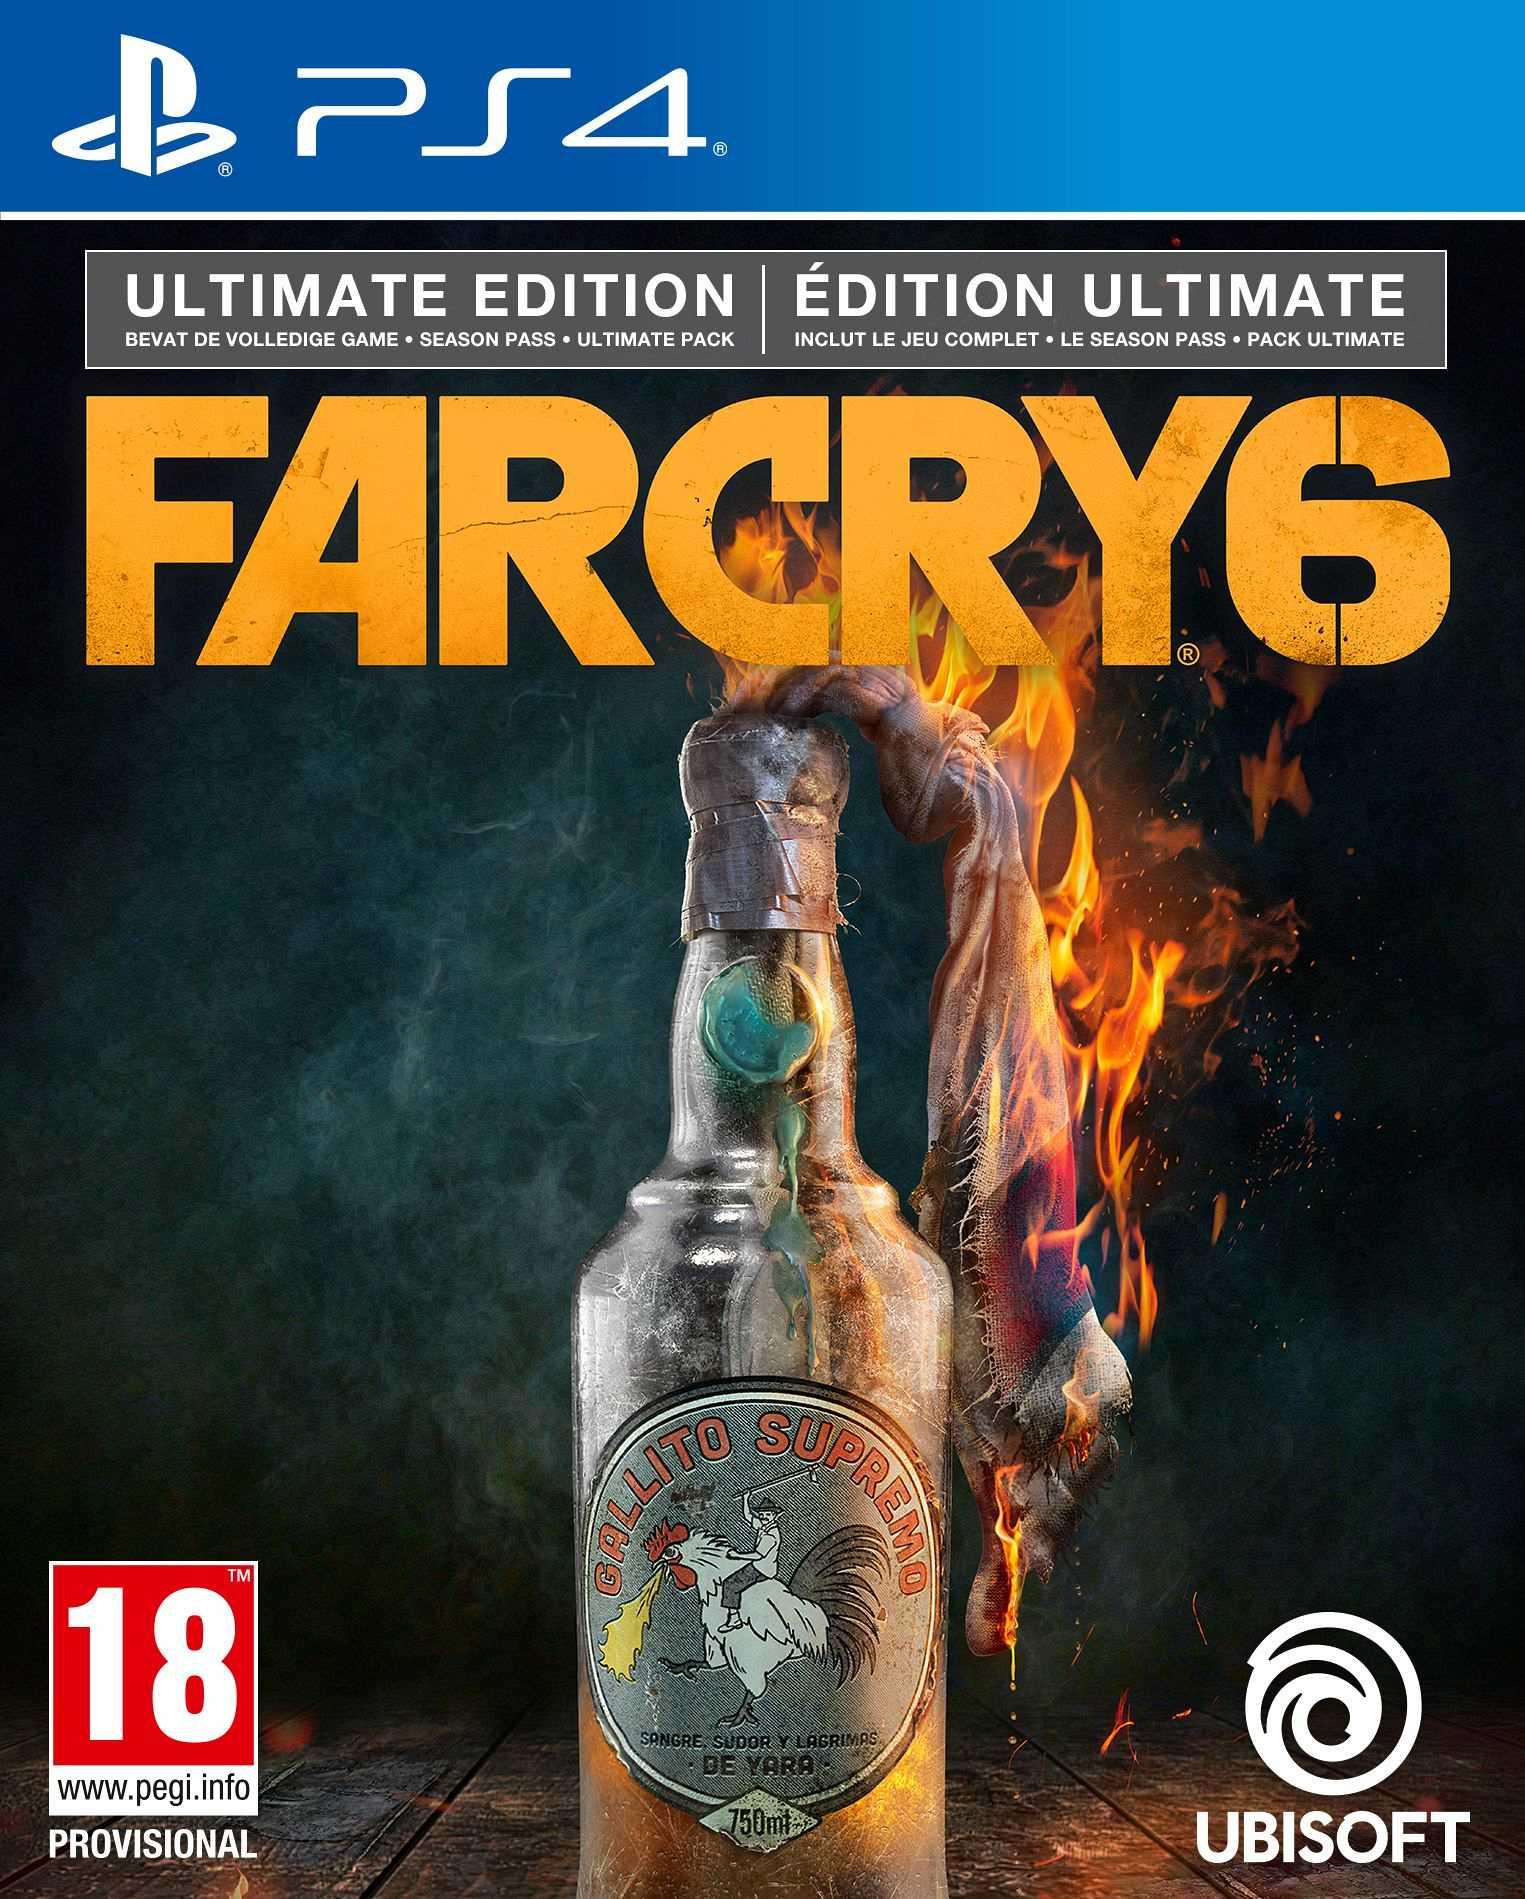 Far Cry 6 - Playstation 4 : Ultimate Edition